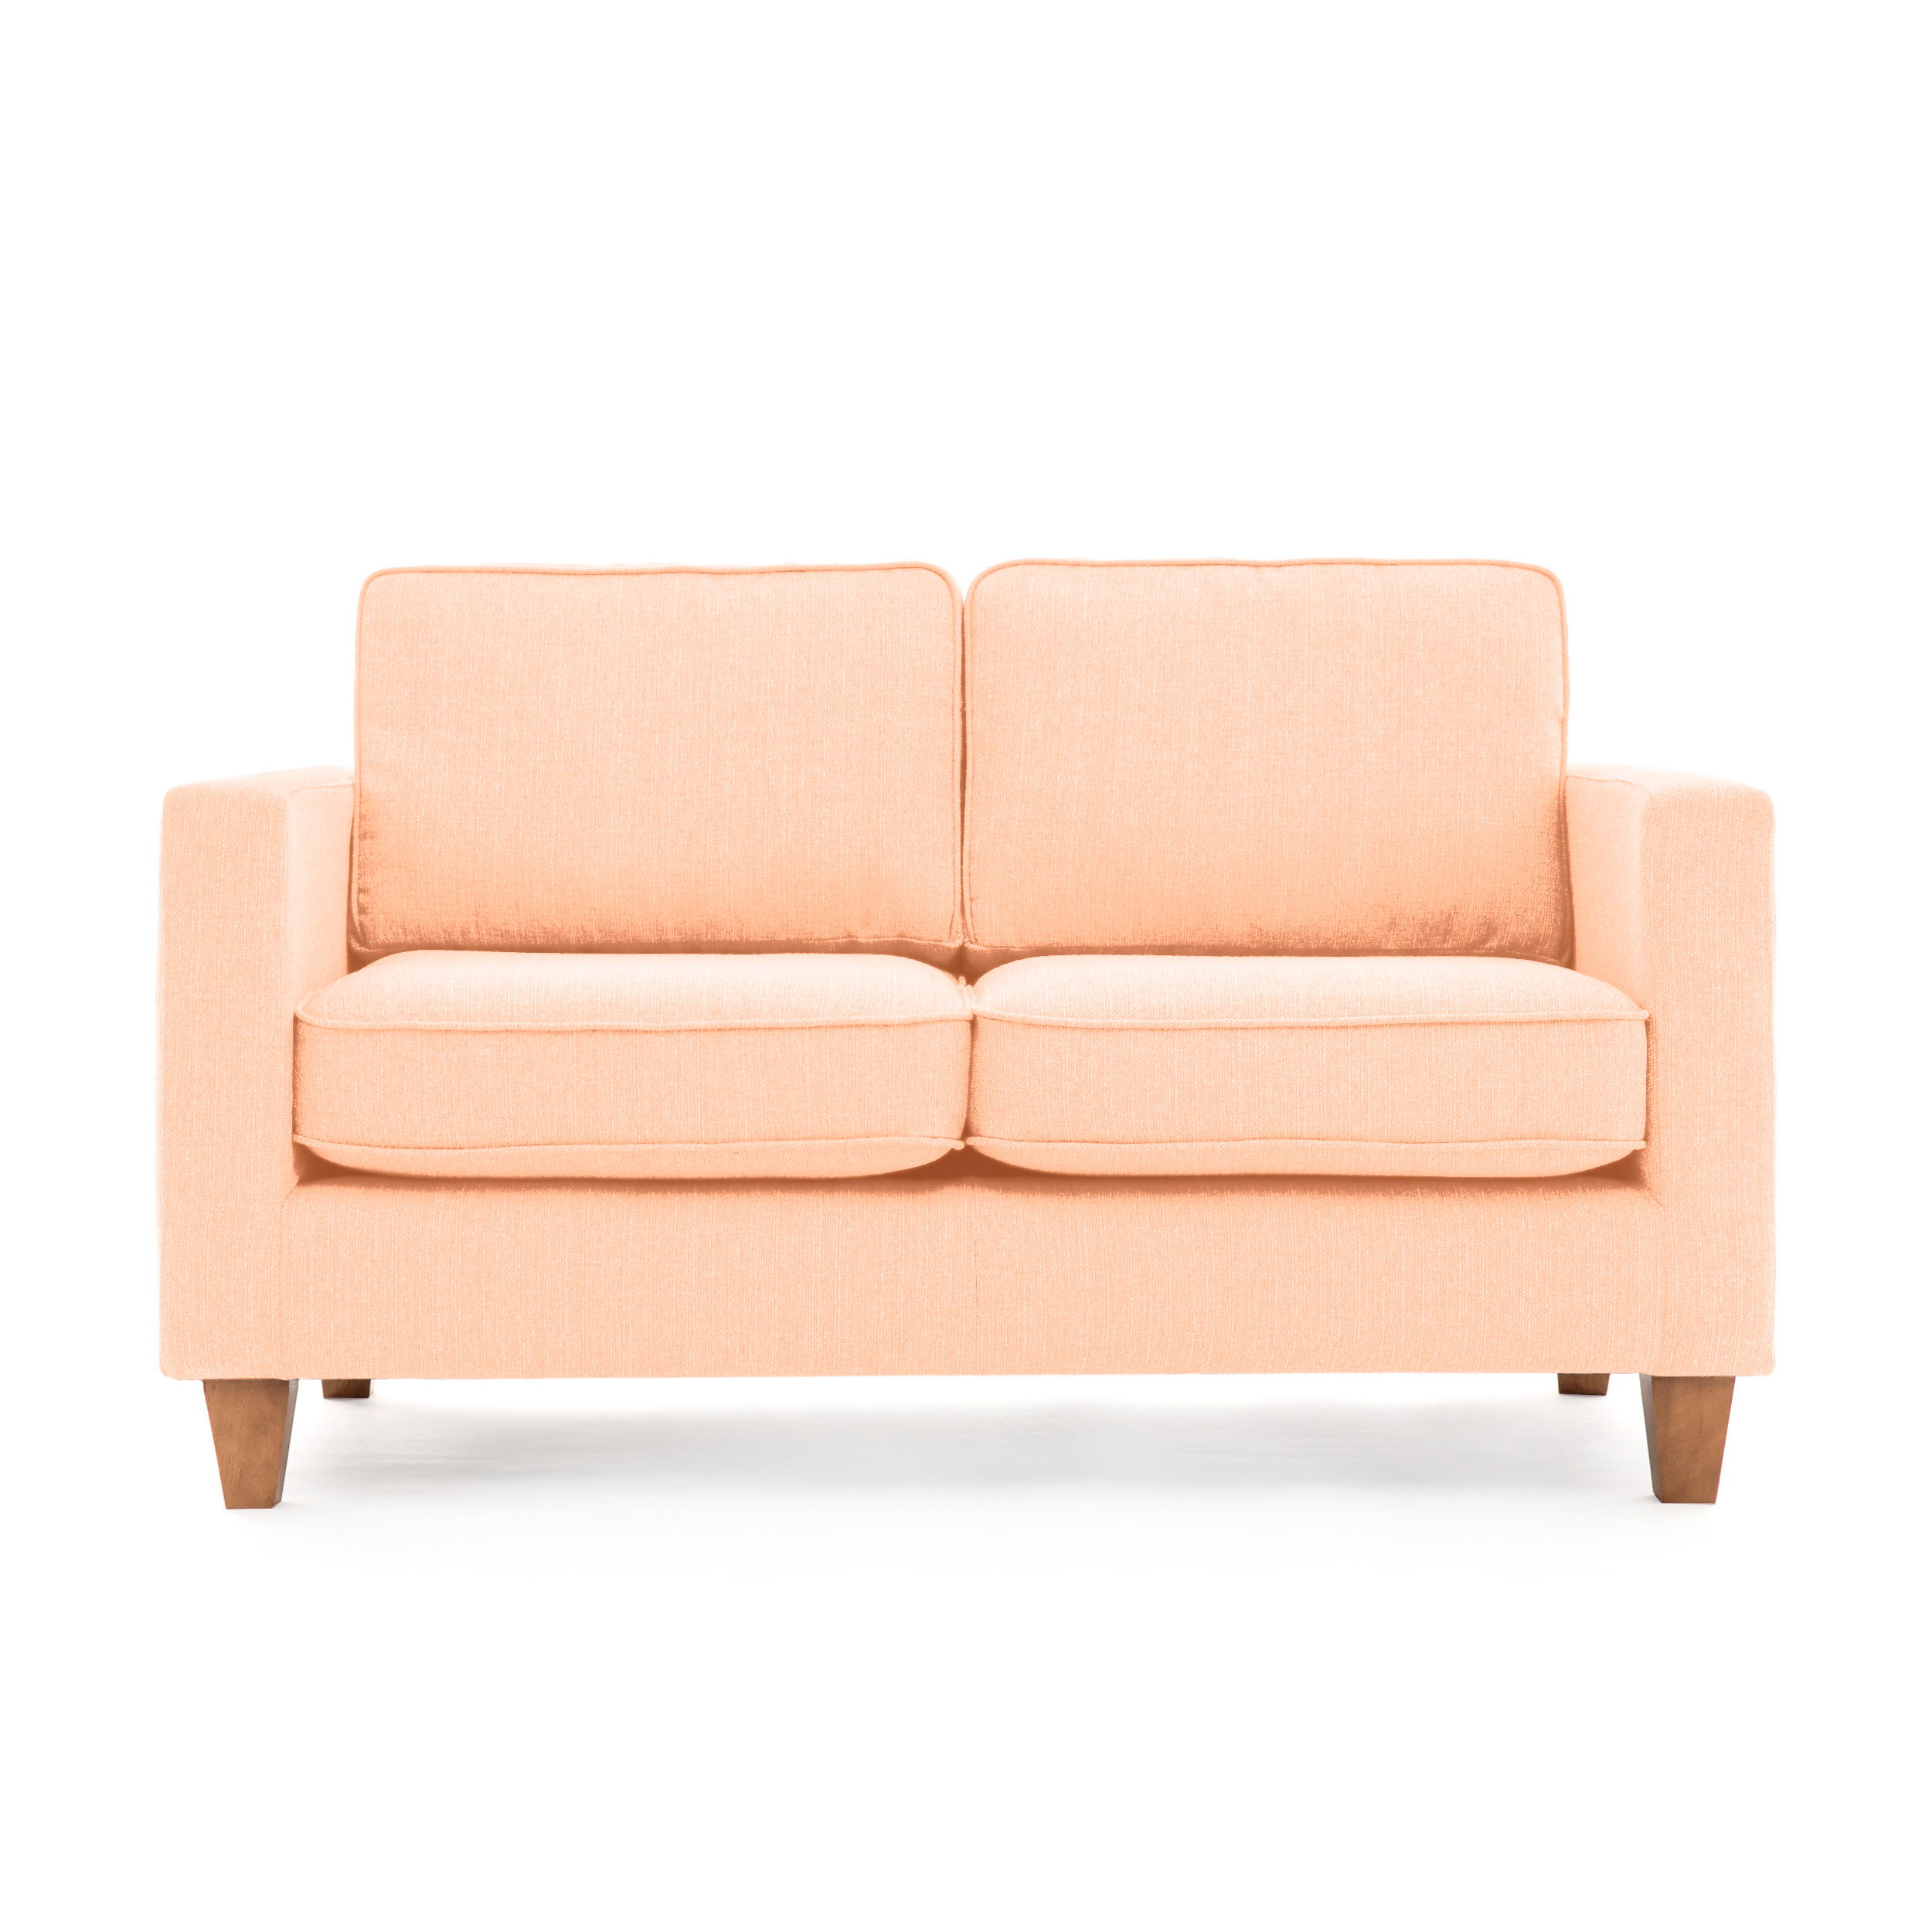 Canapea Fixa 2 locuri Sorio Light pink